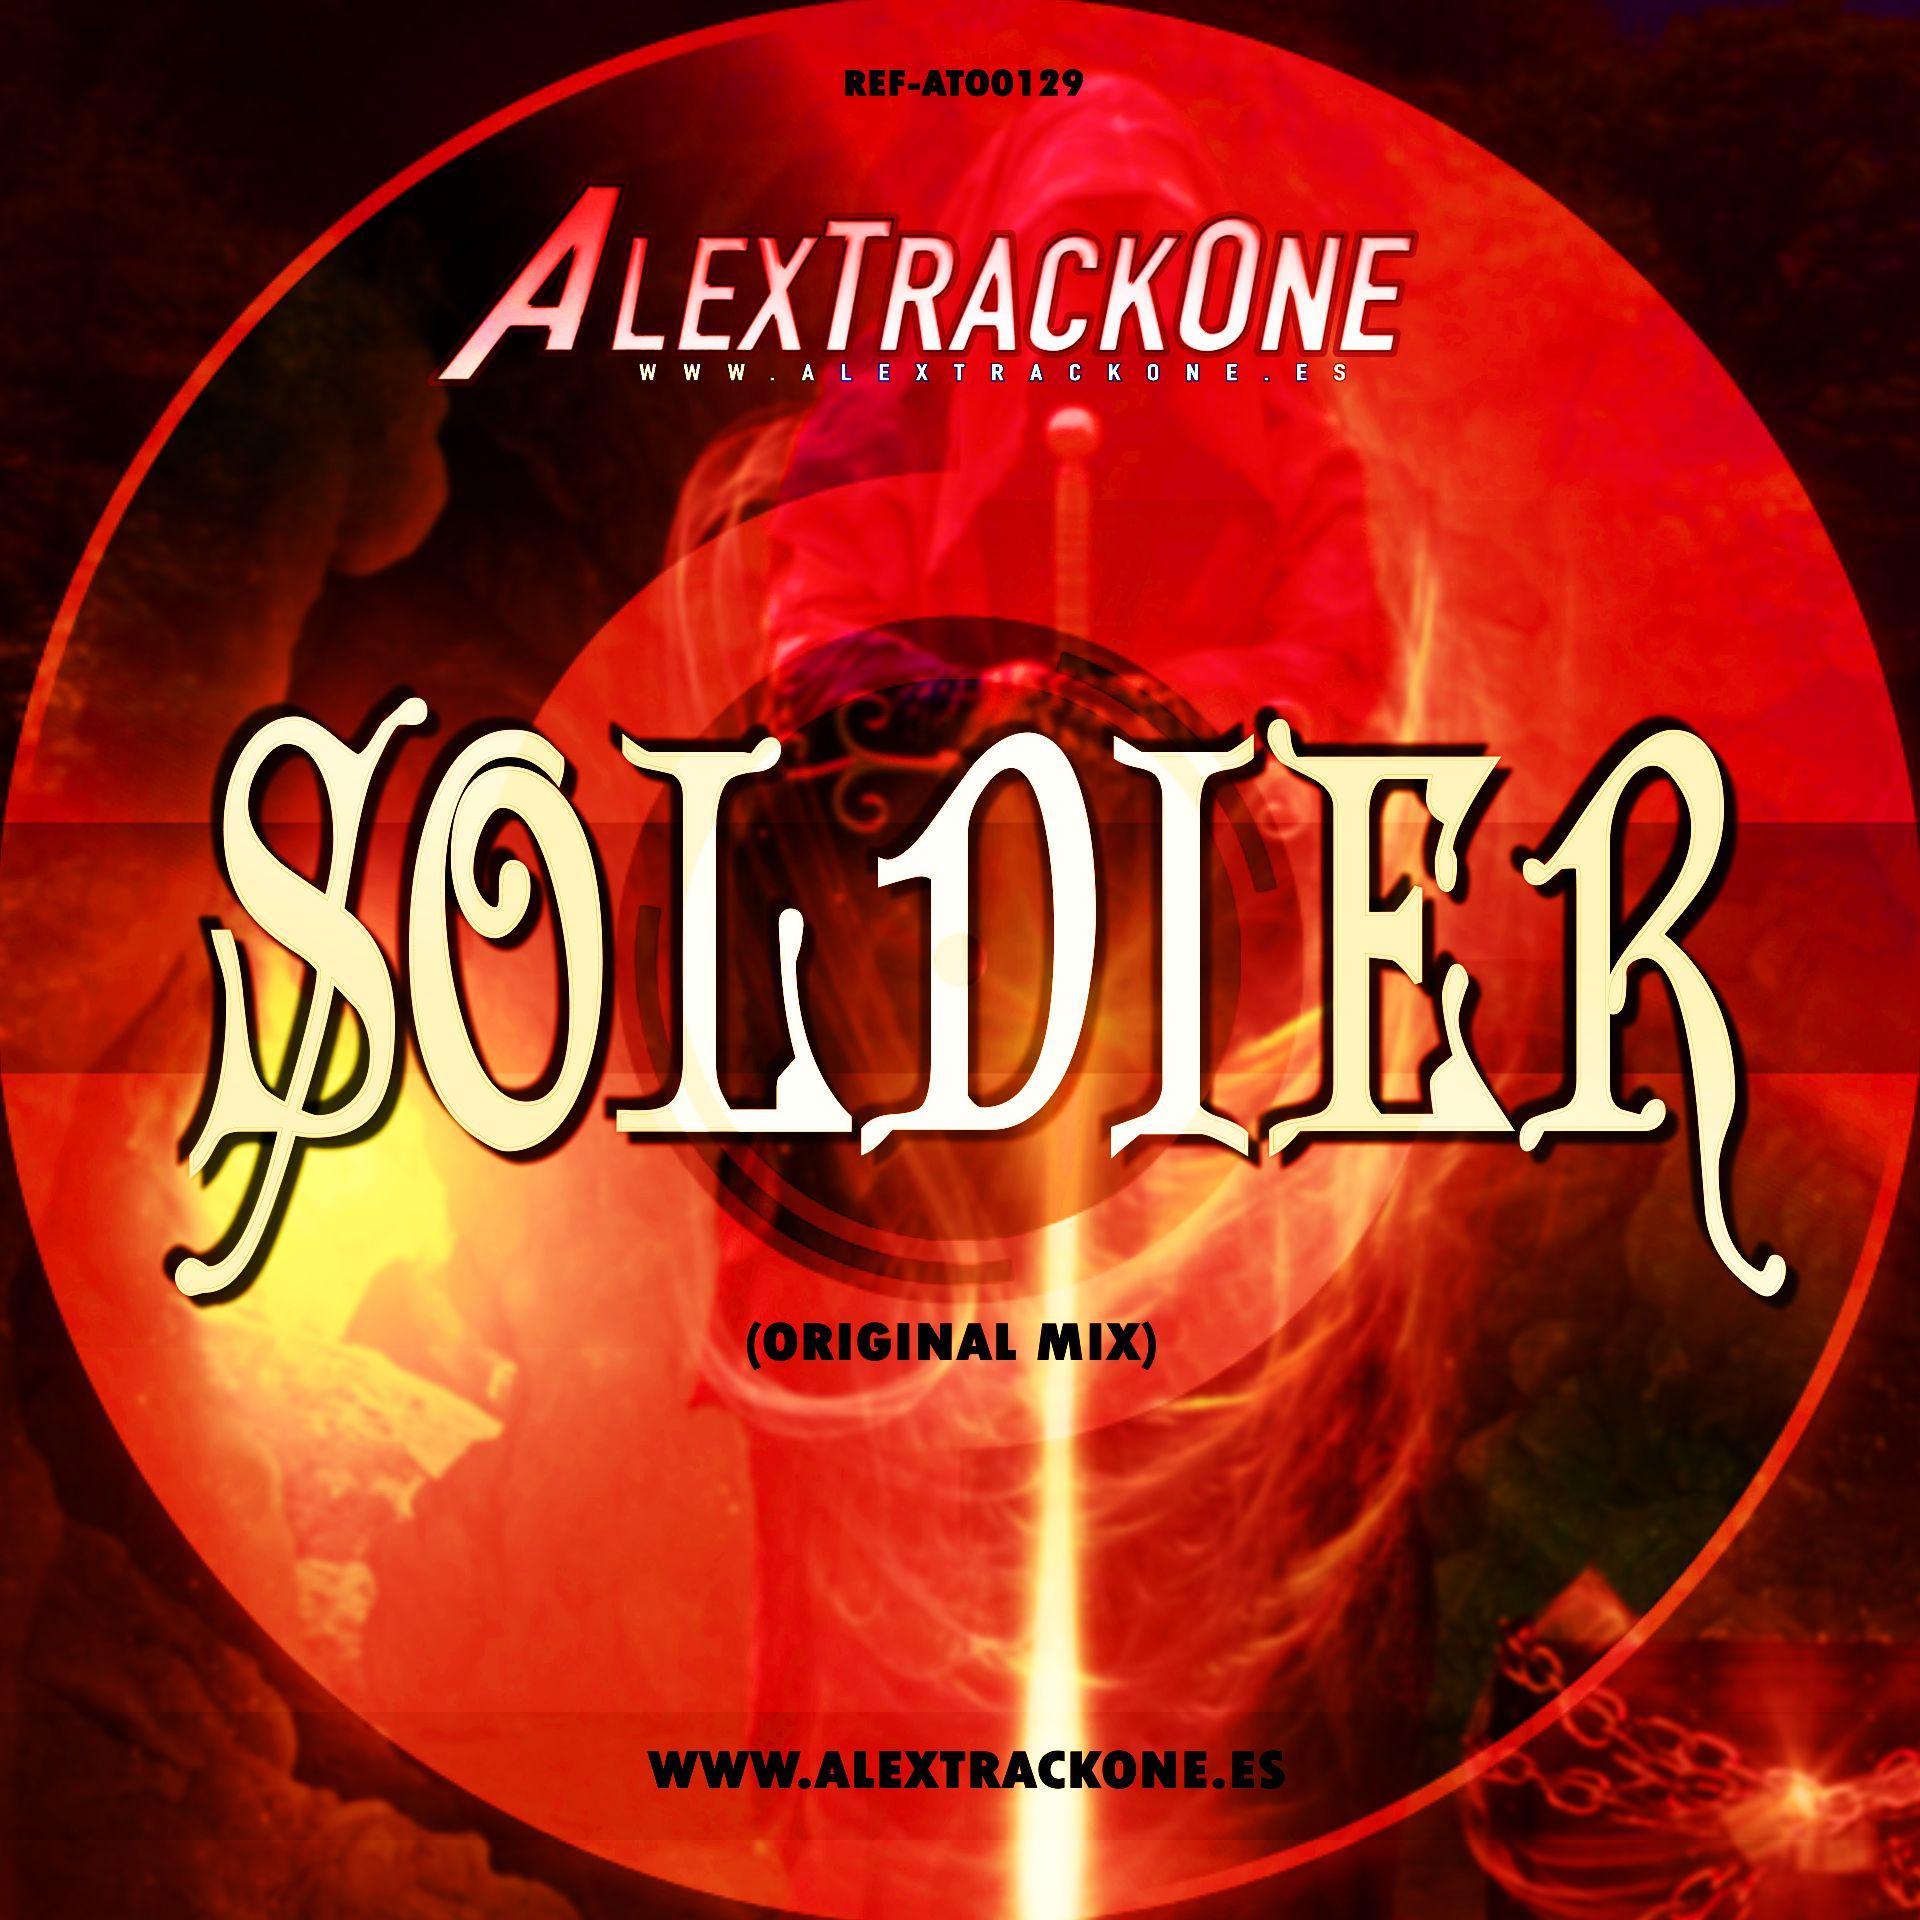 REF-ATO0129 SOLDIER (RADIO MIX) (MP3 & WAV & FLAC)